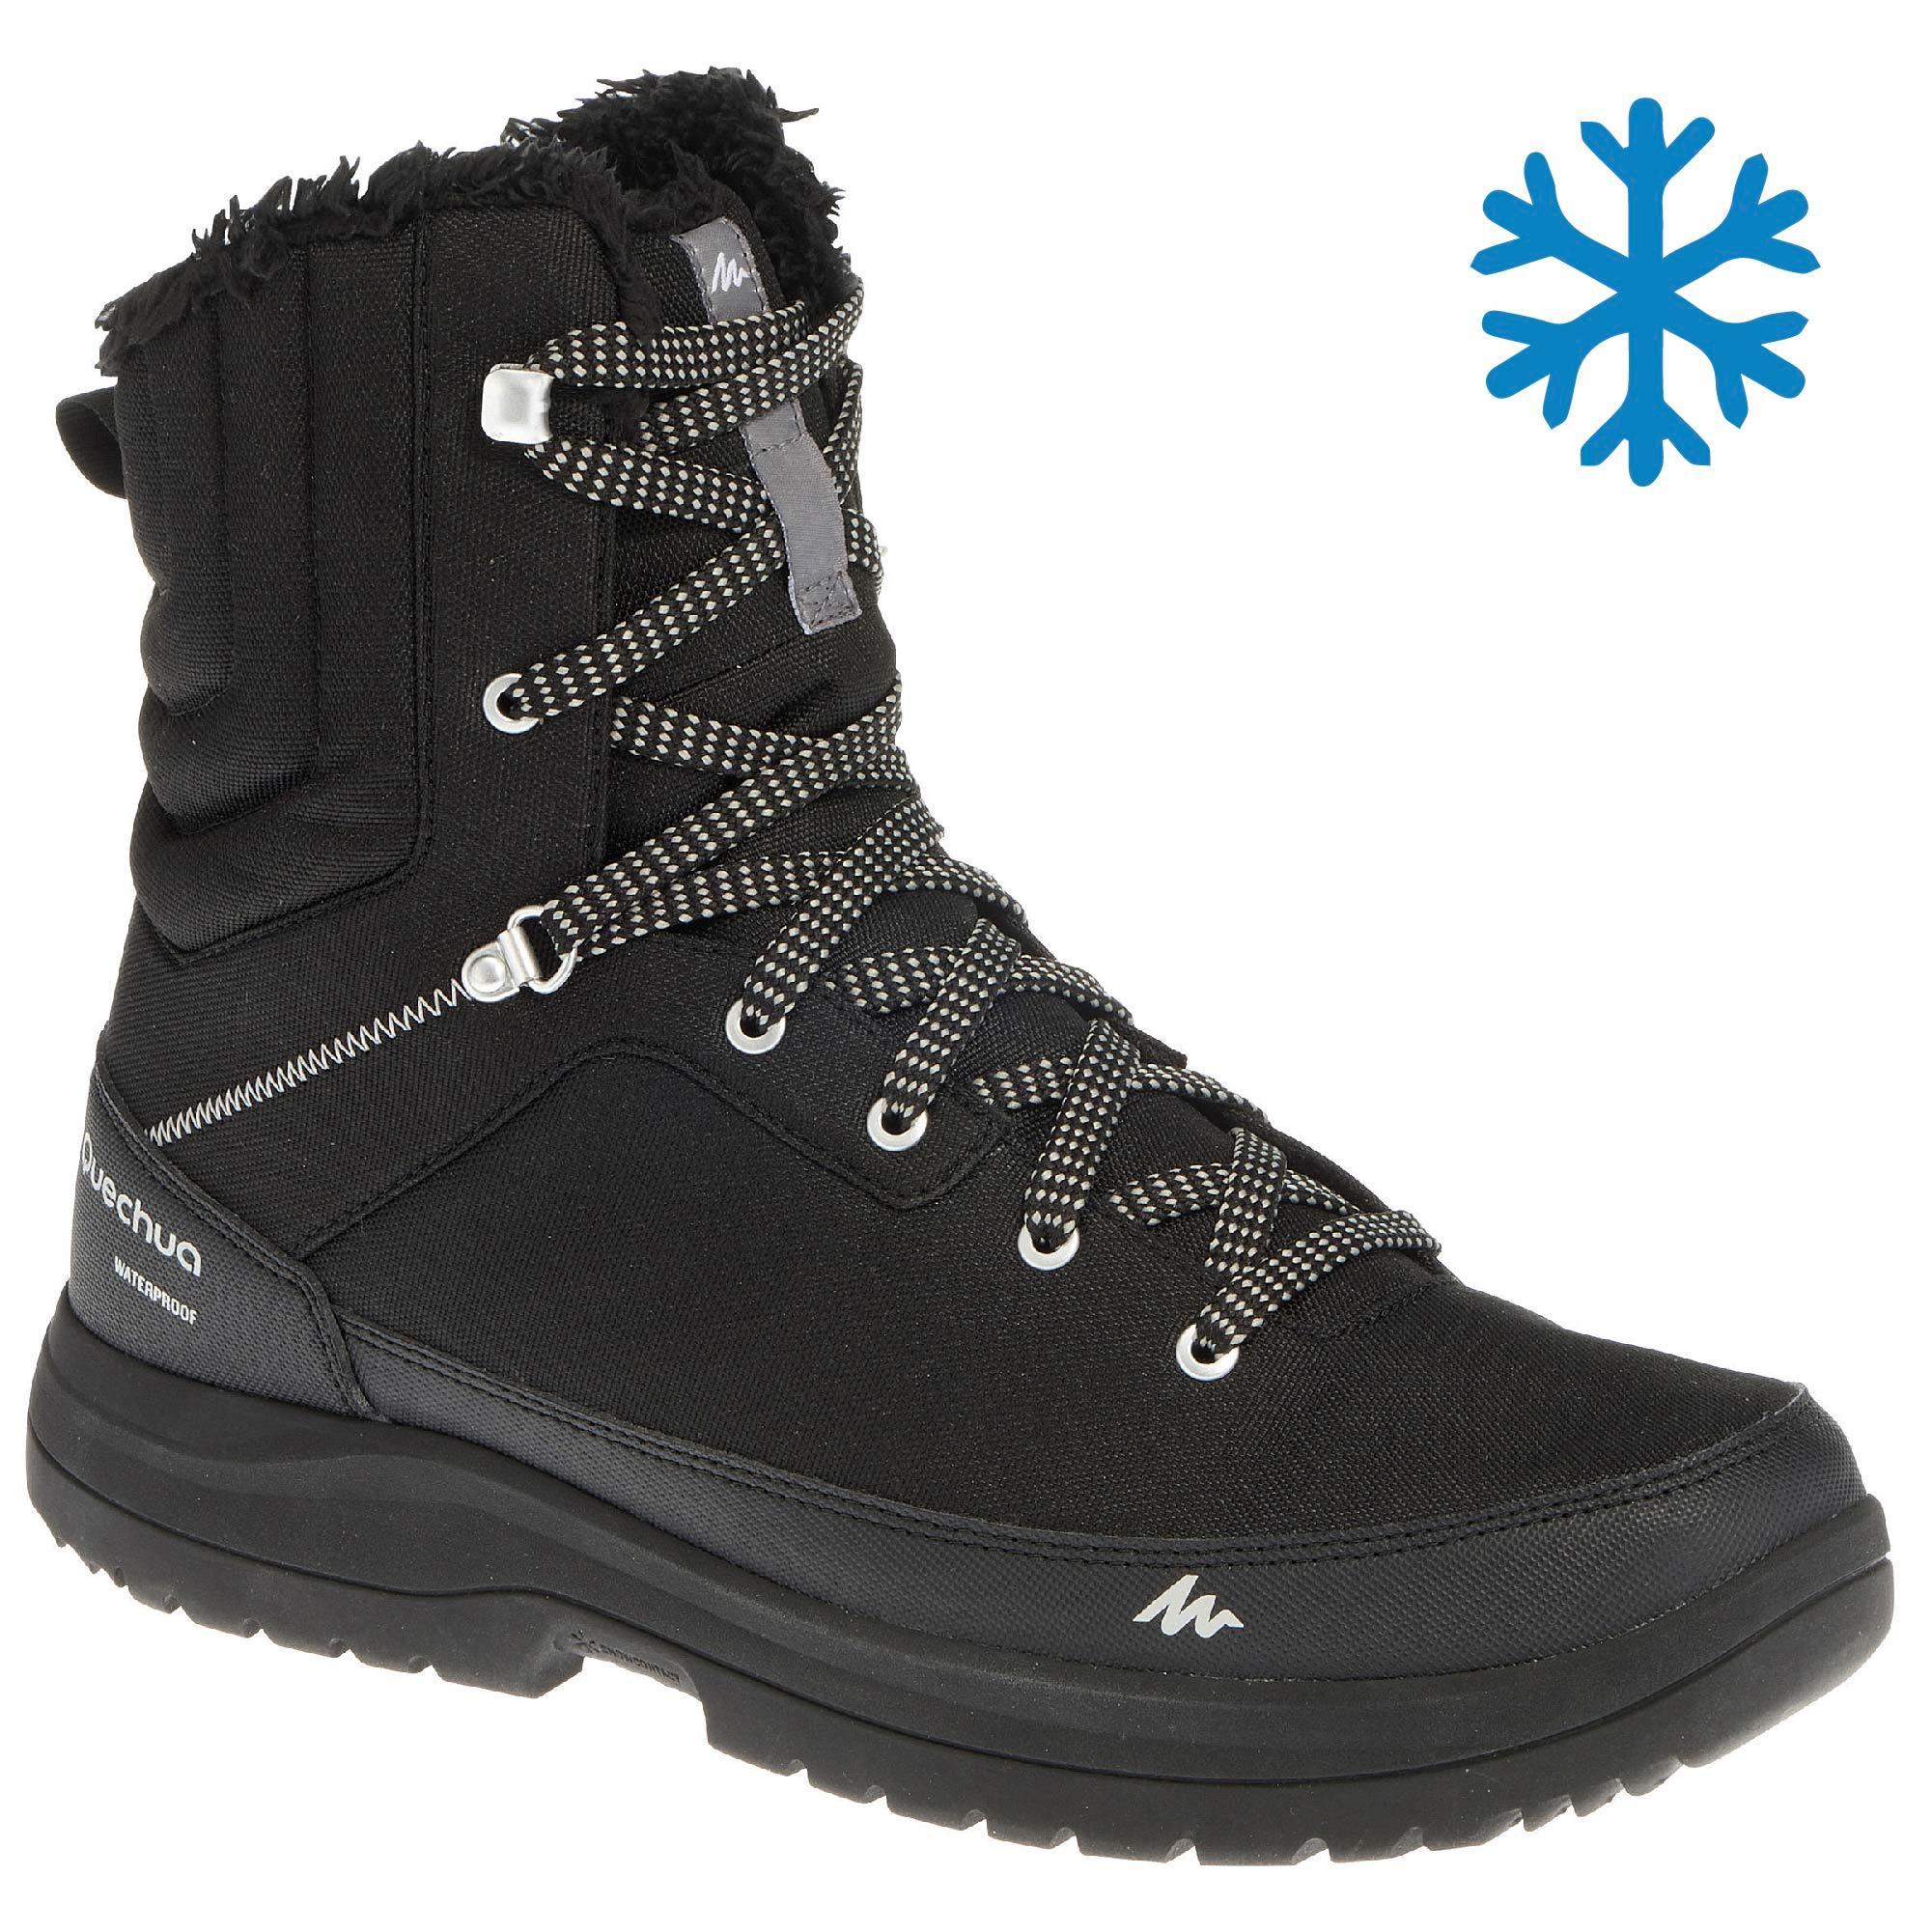 SH100 Quechua Snow Hiking Boots